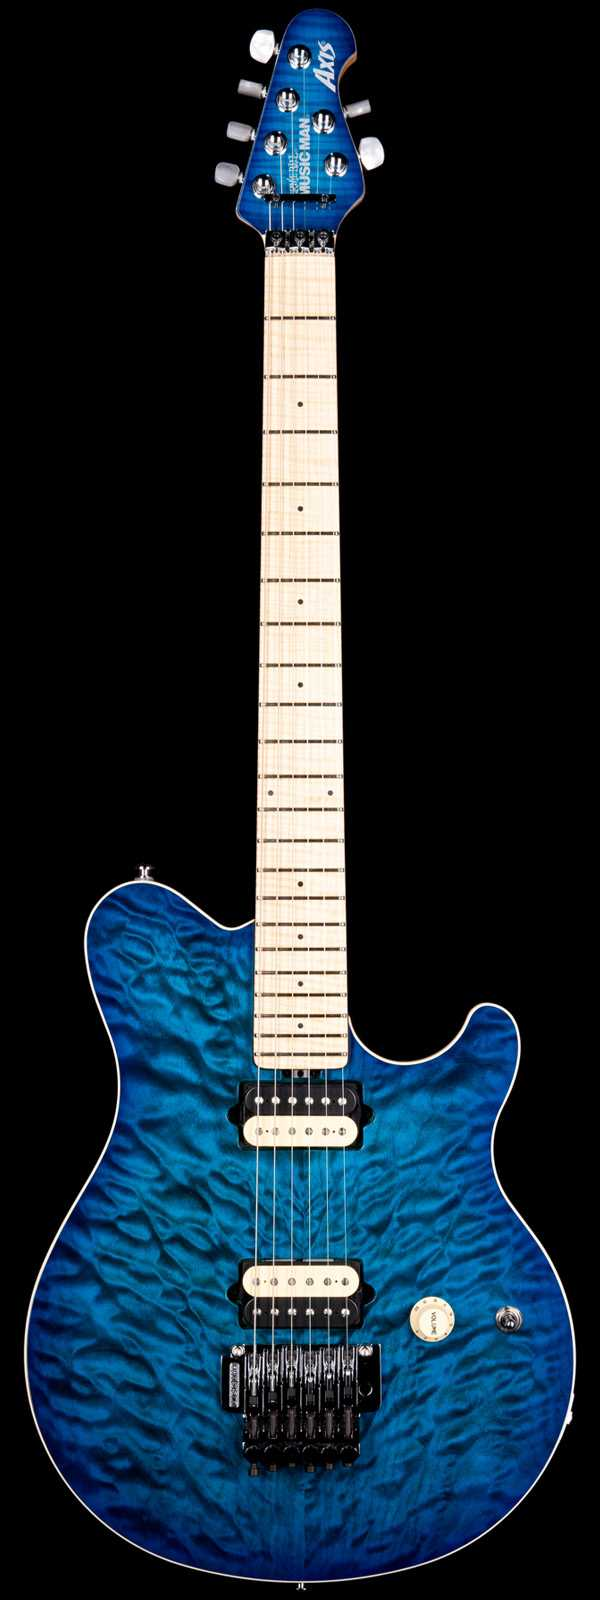 Ernie Ball Music Man Axis Quilt Balboa Blue Burst with Matching Headstock